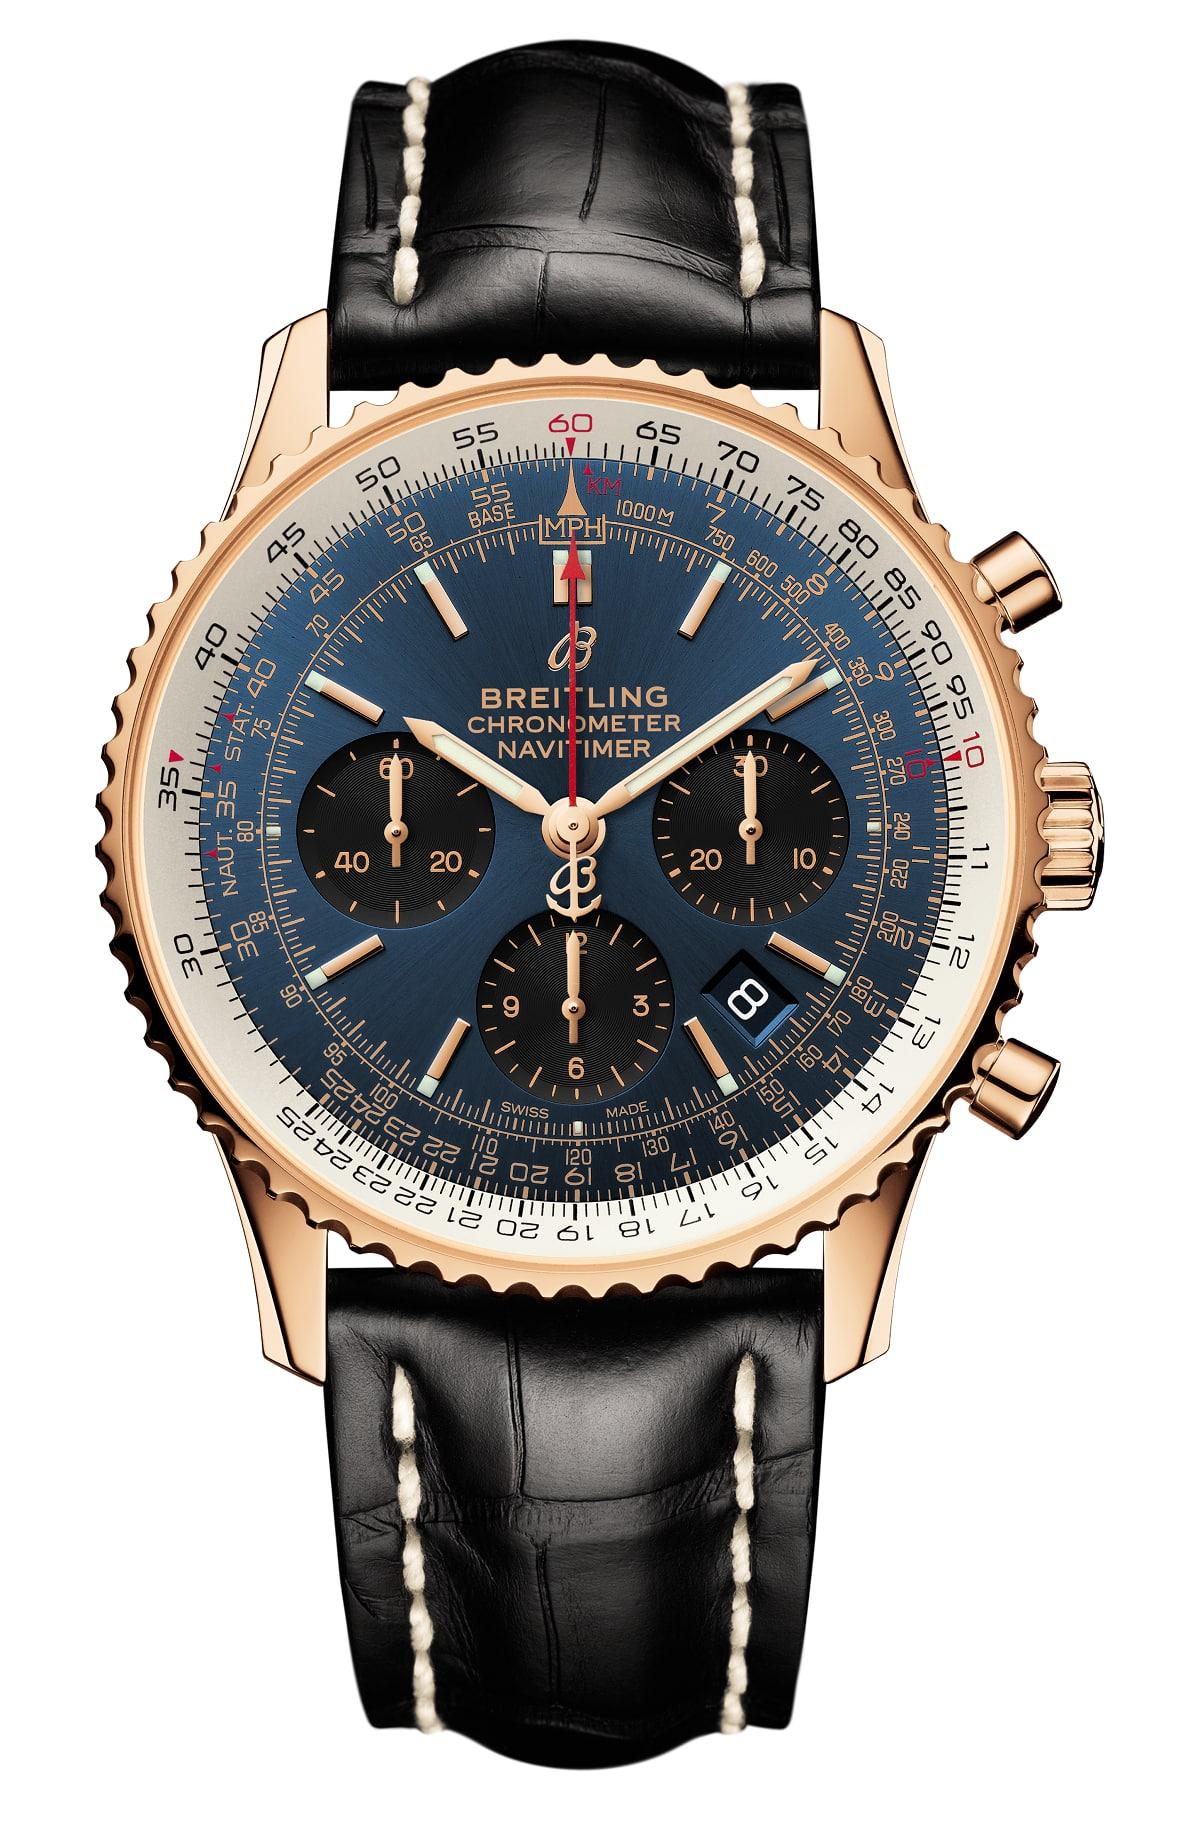 breitling-navitimer-1-b01-chronograph-watch-05.jpg